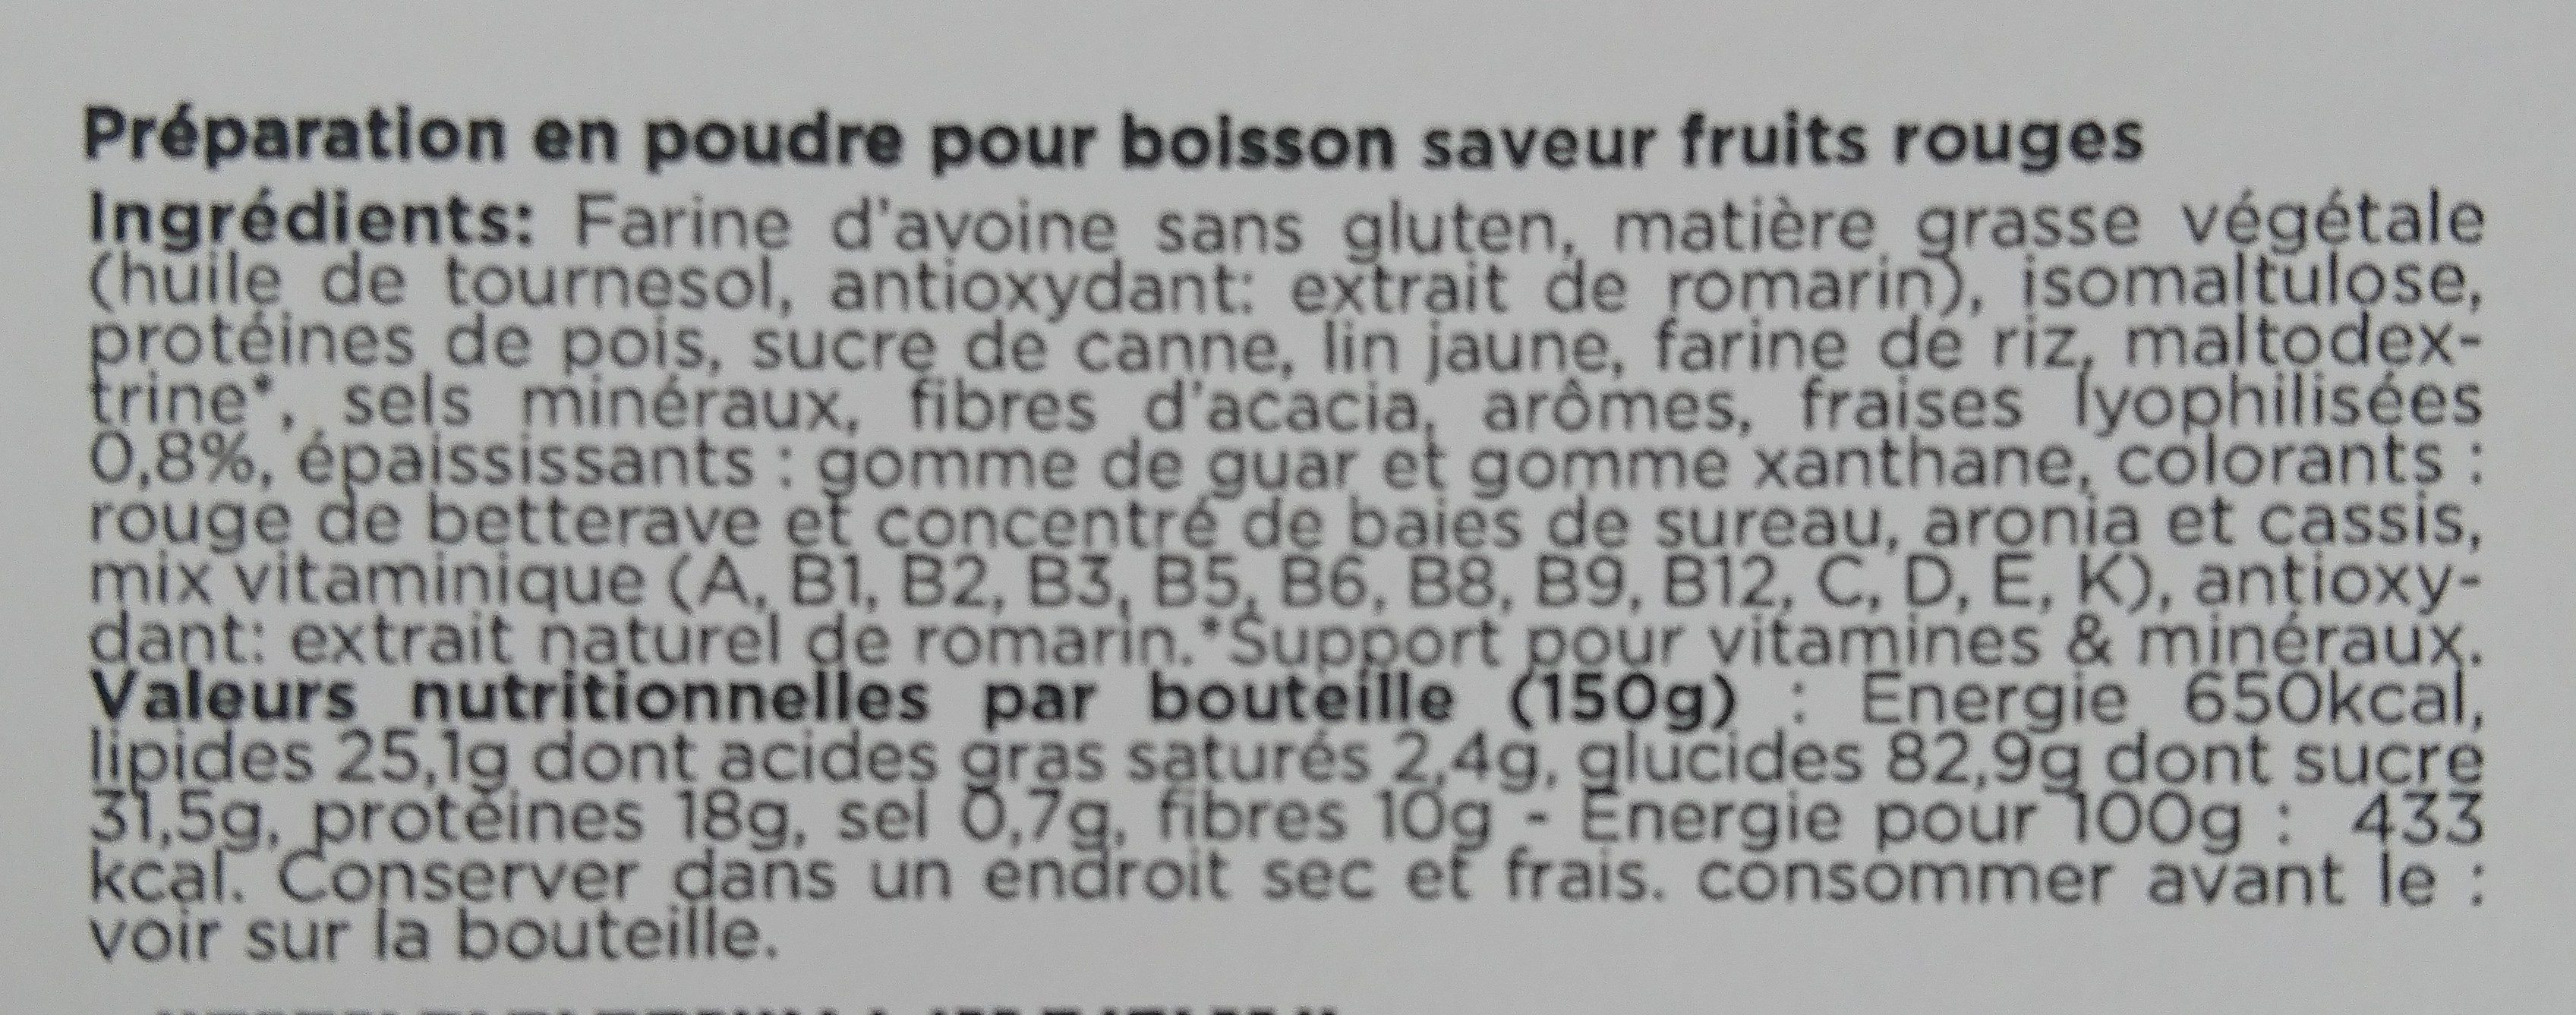 Feed Saveur fruits rouges - Ingrédients - fr